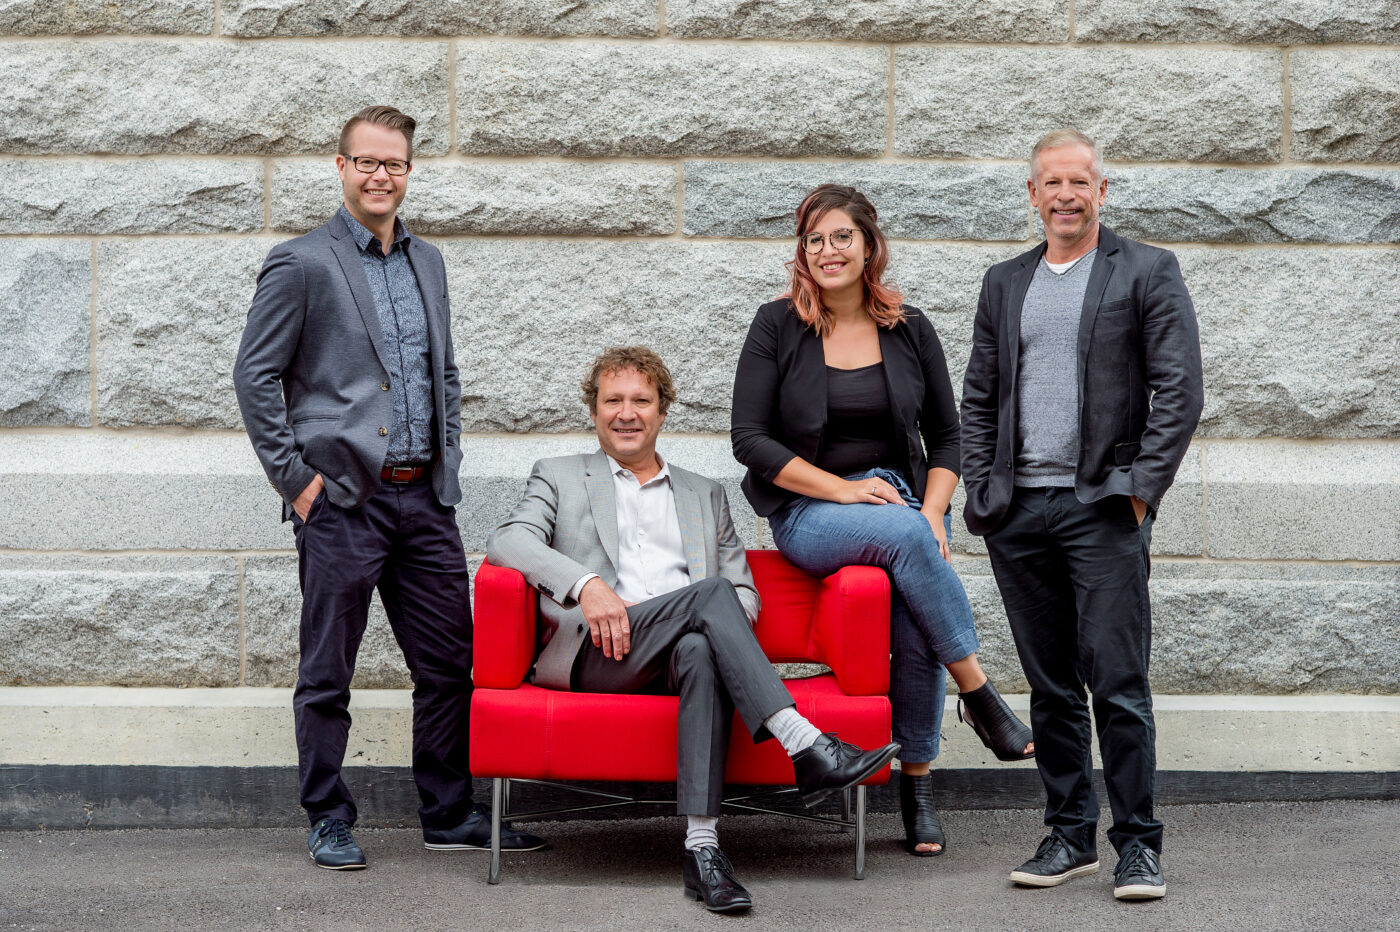 architectes espace vital architecture sherbrooke